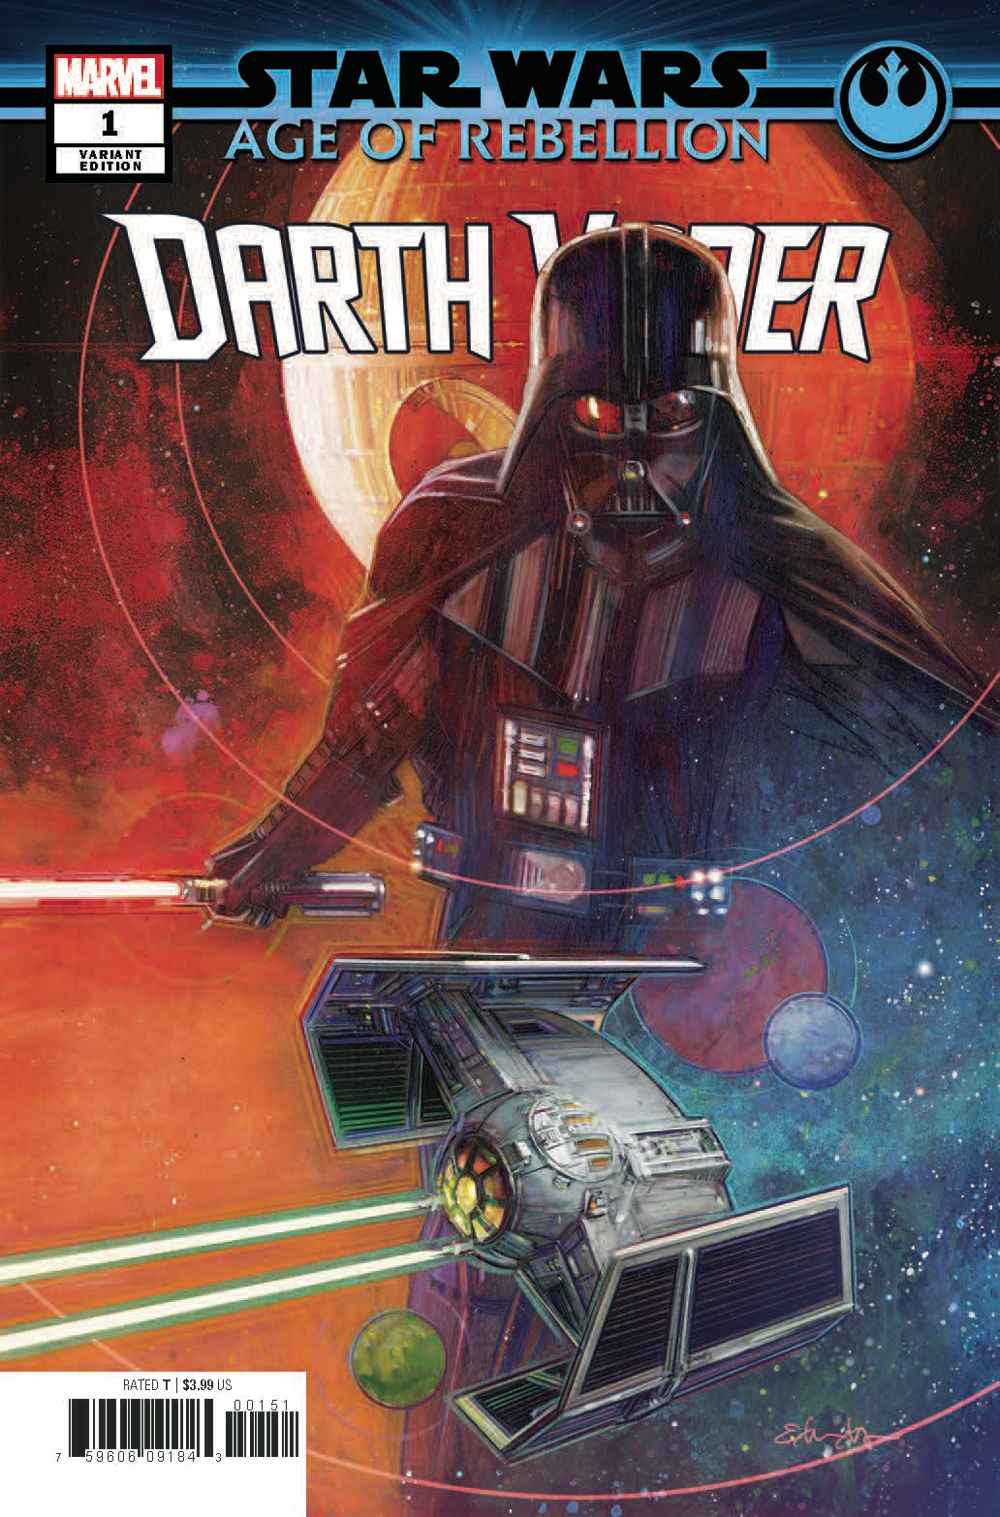 Age of Rebellion: Darth Vader #1 (Tommy Lee Edwards Variant Cover) (26.06.2019)